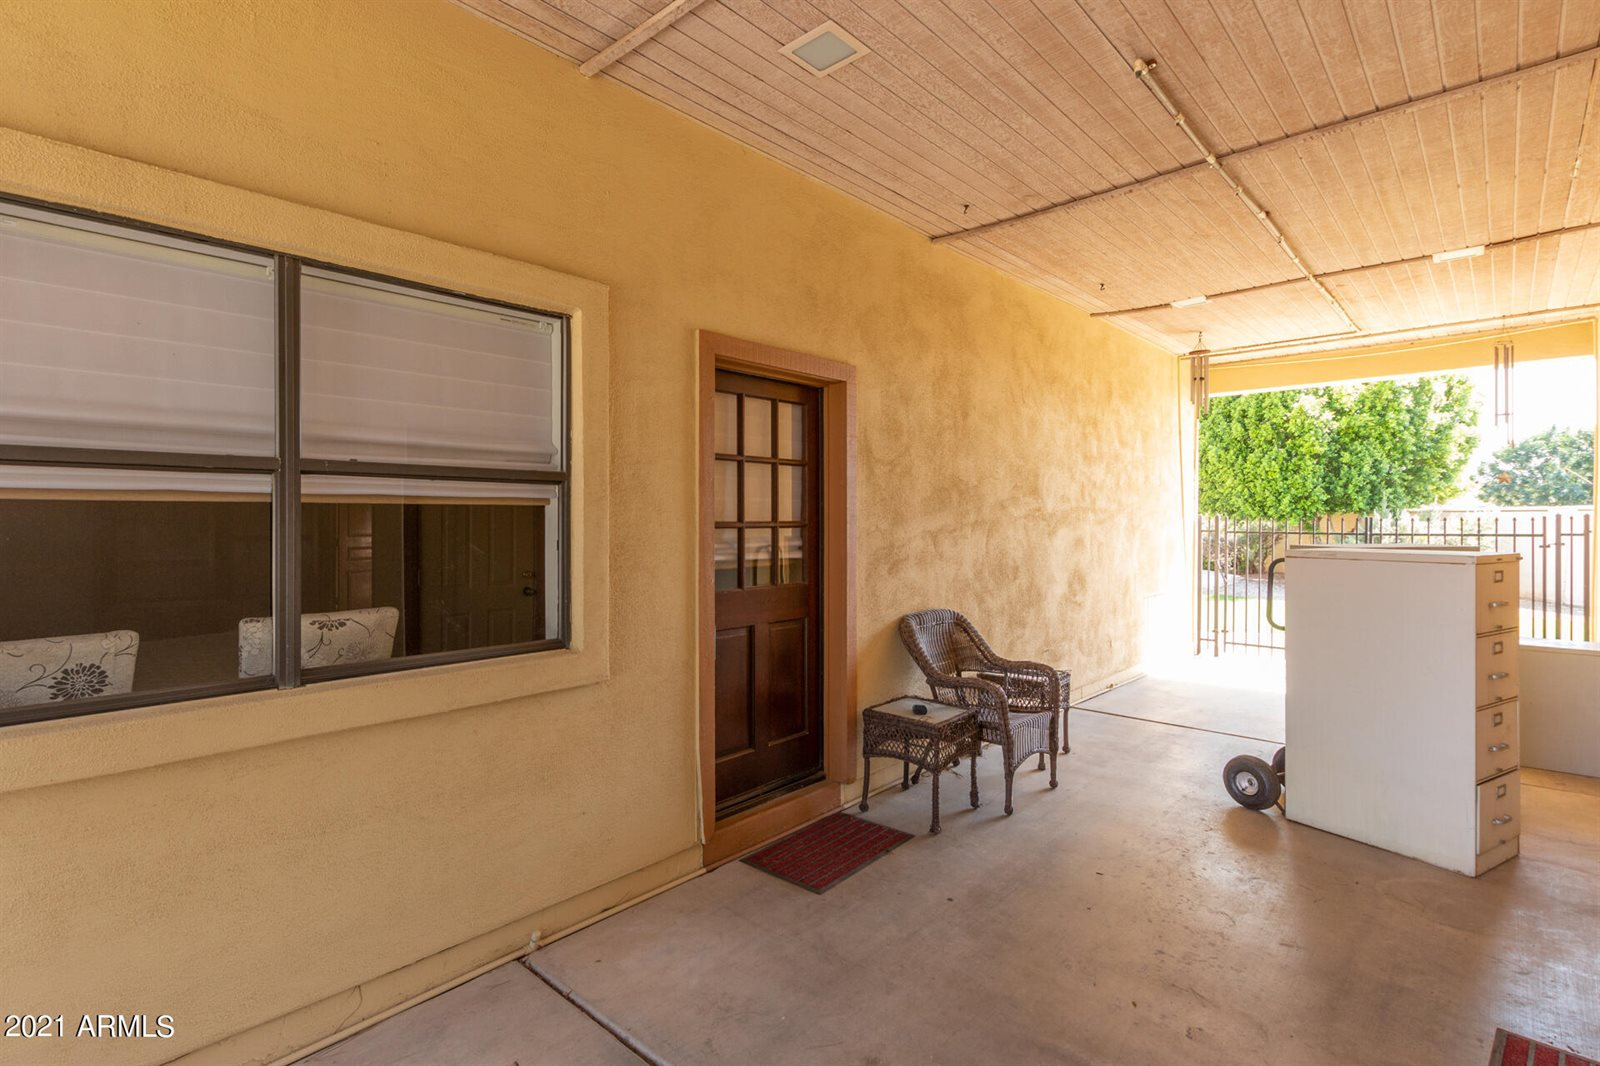 3803 East Flossmoor Circle, Mesa, AZ 85206